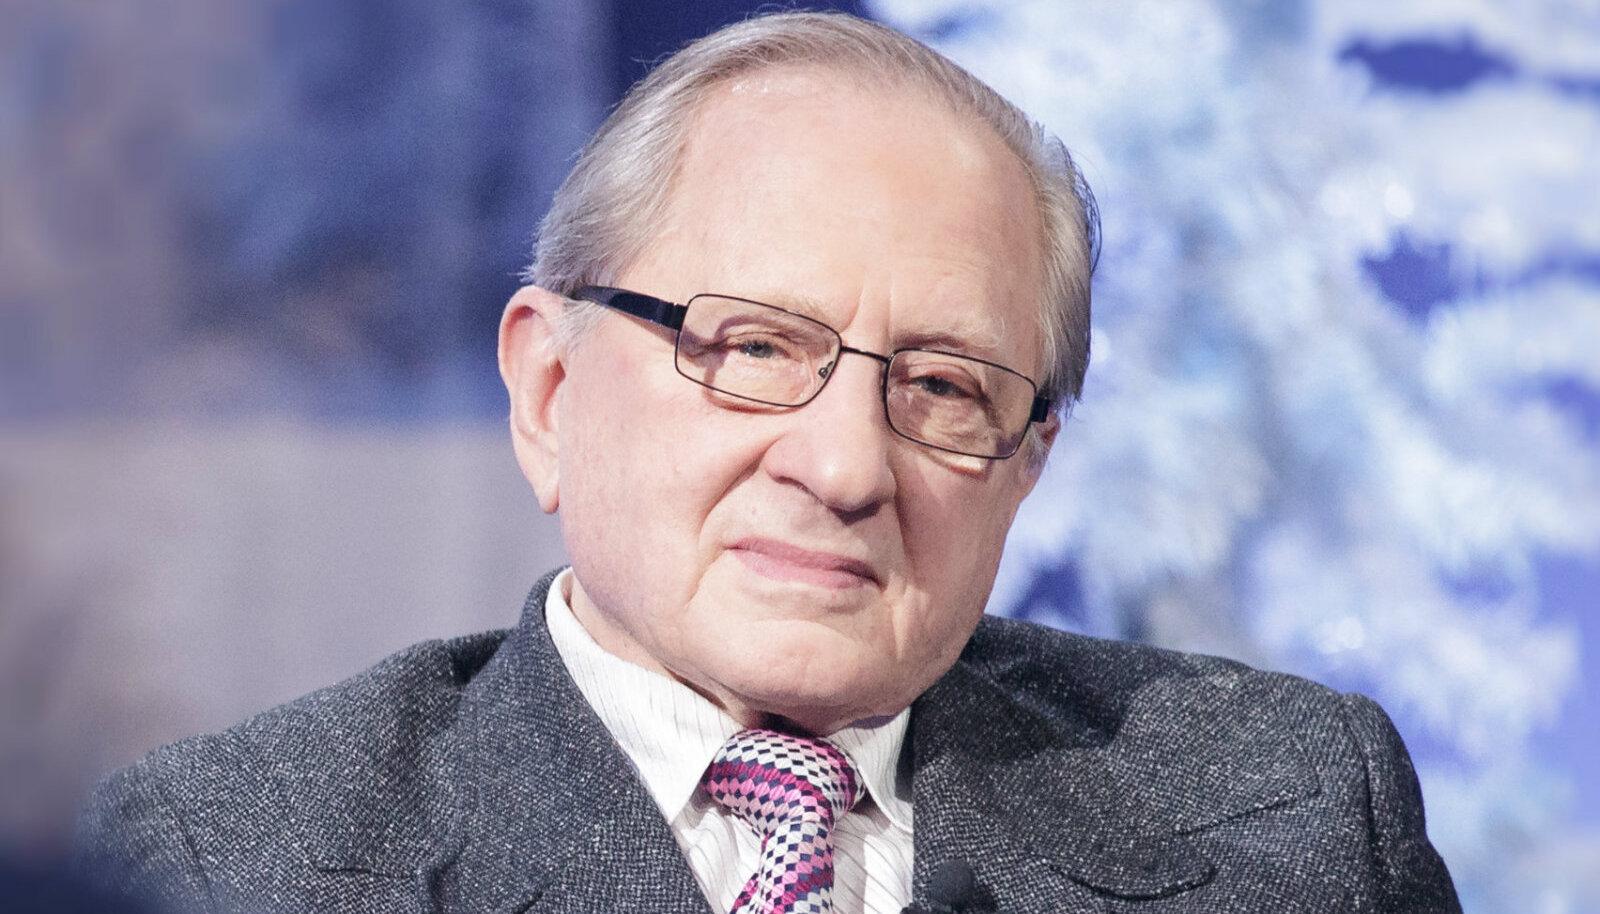 Dr Adik Levin